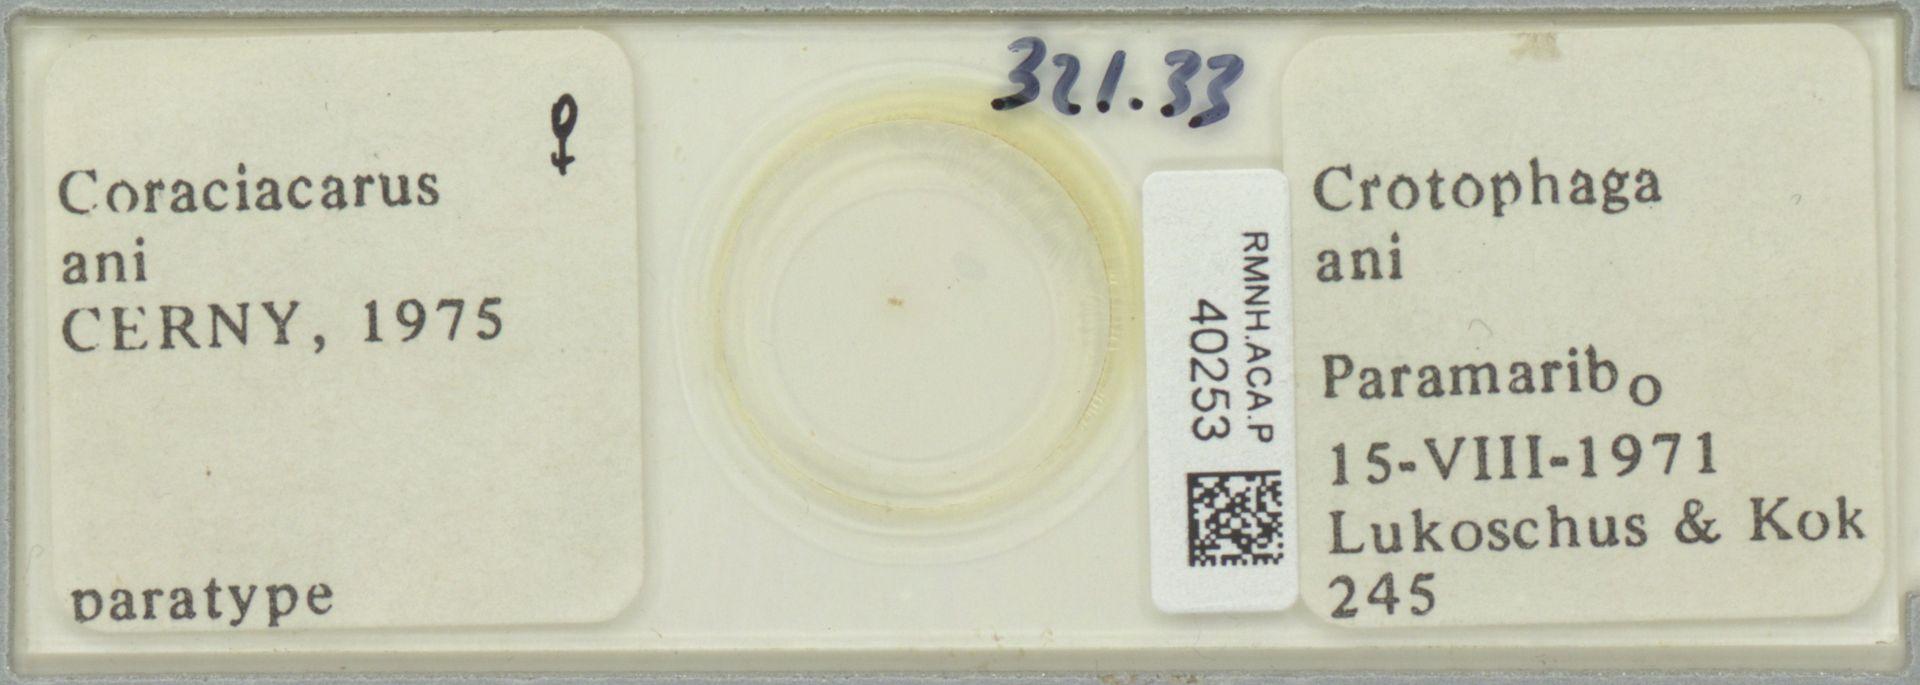 RMNH.ACA.P.40253 | Coraciacarus ani Cerny, 1975